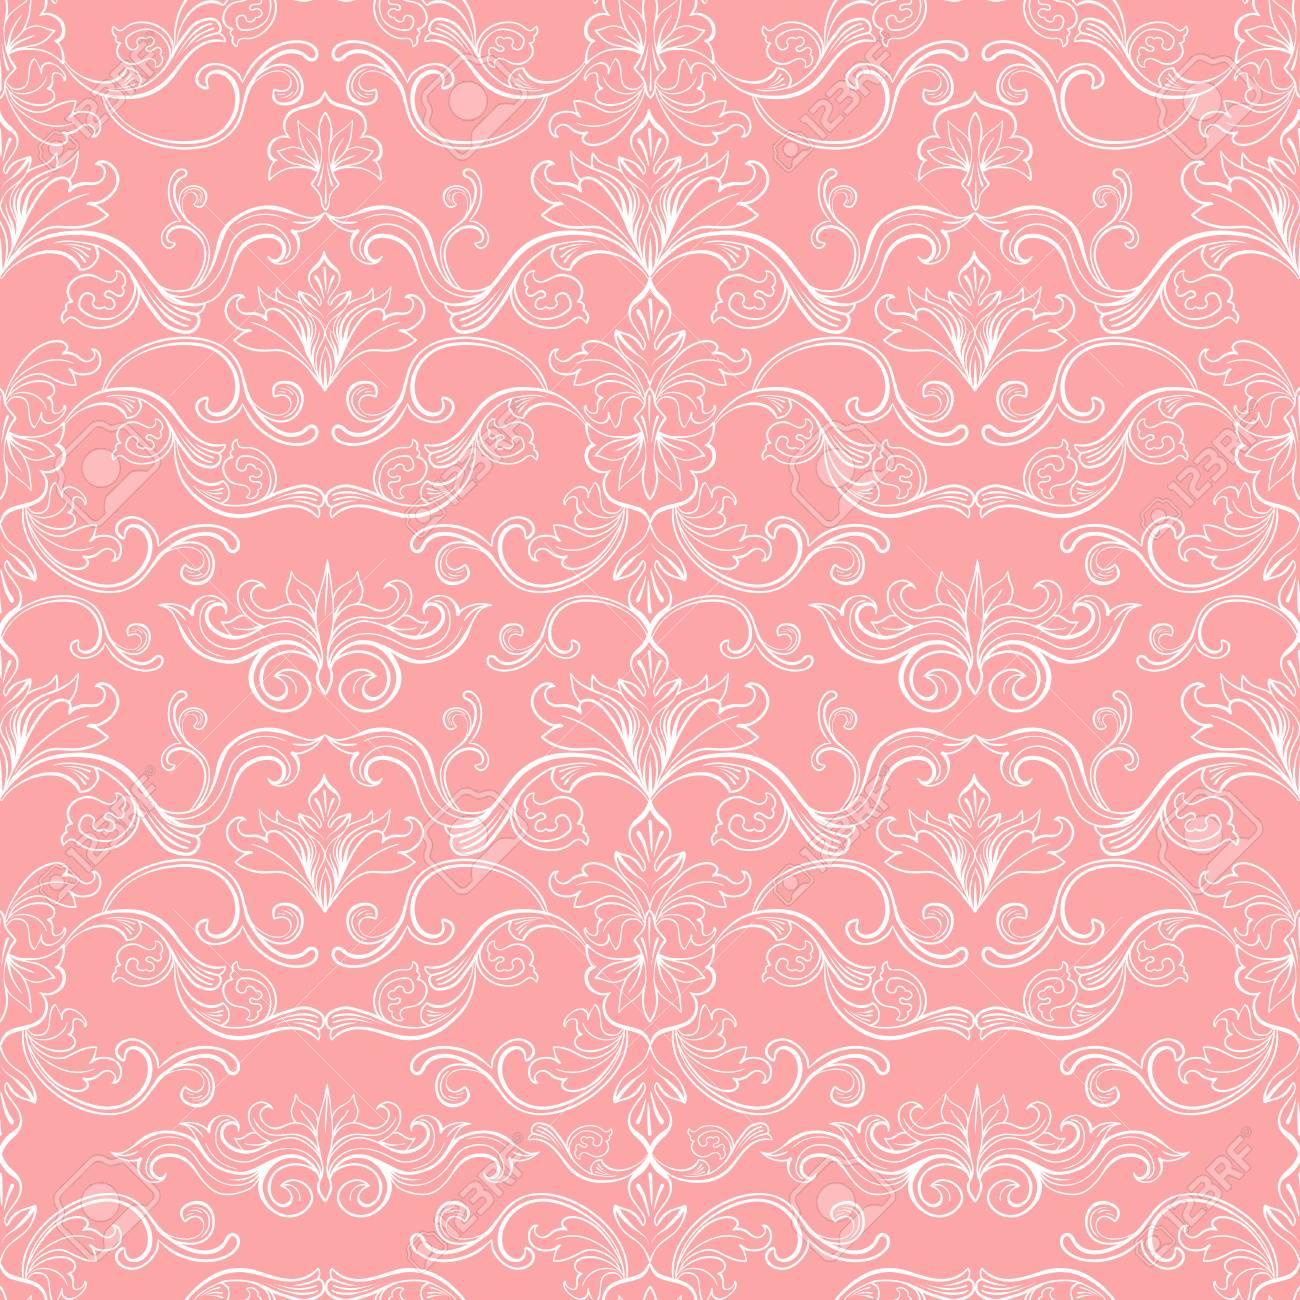 Damask Vector Seamless Pattern Vintage Style Wallpaper Carpet